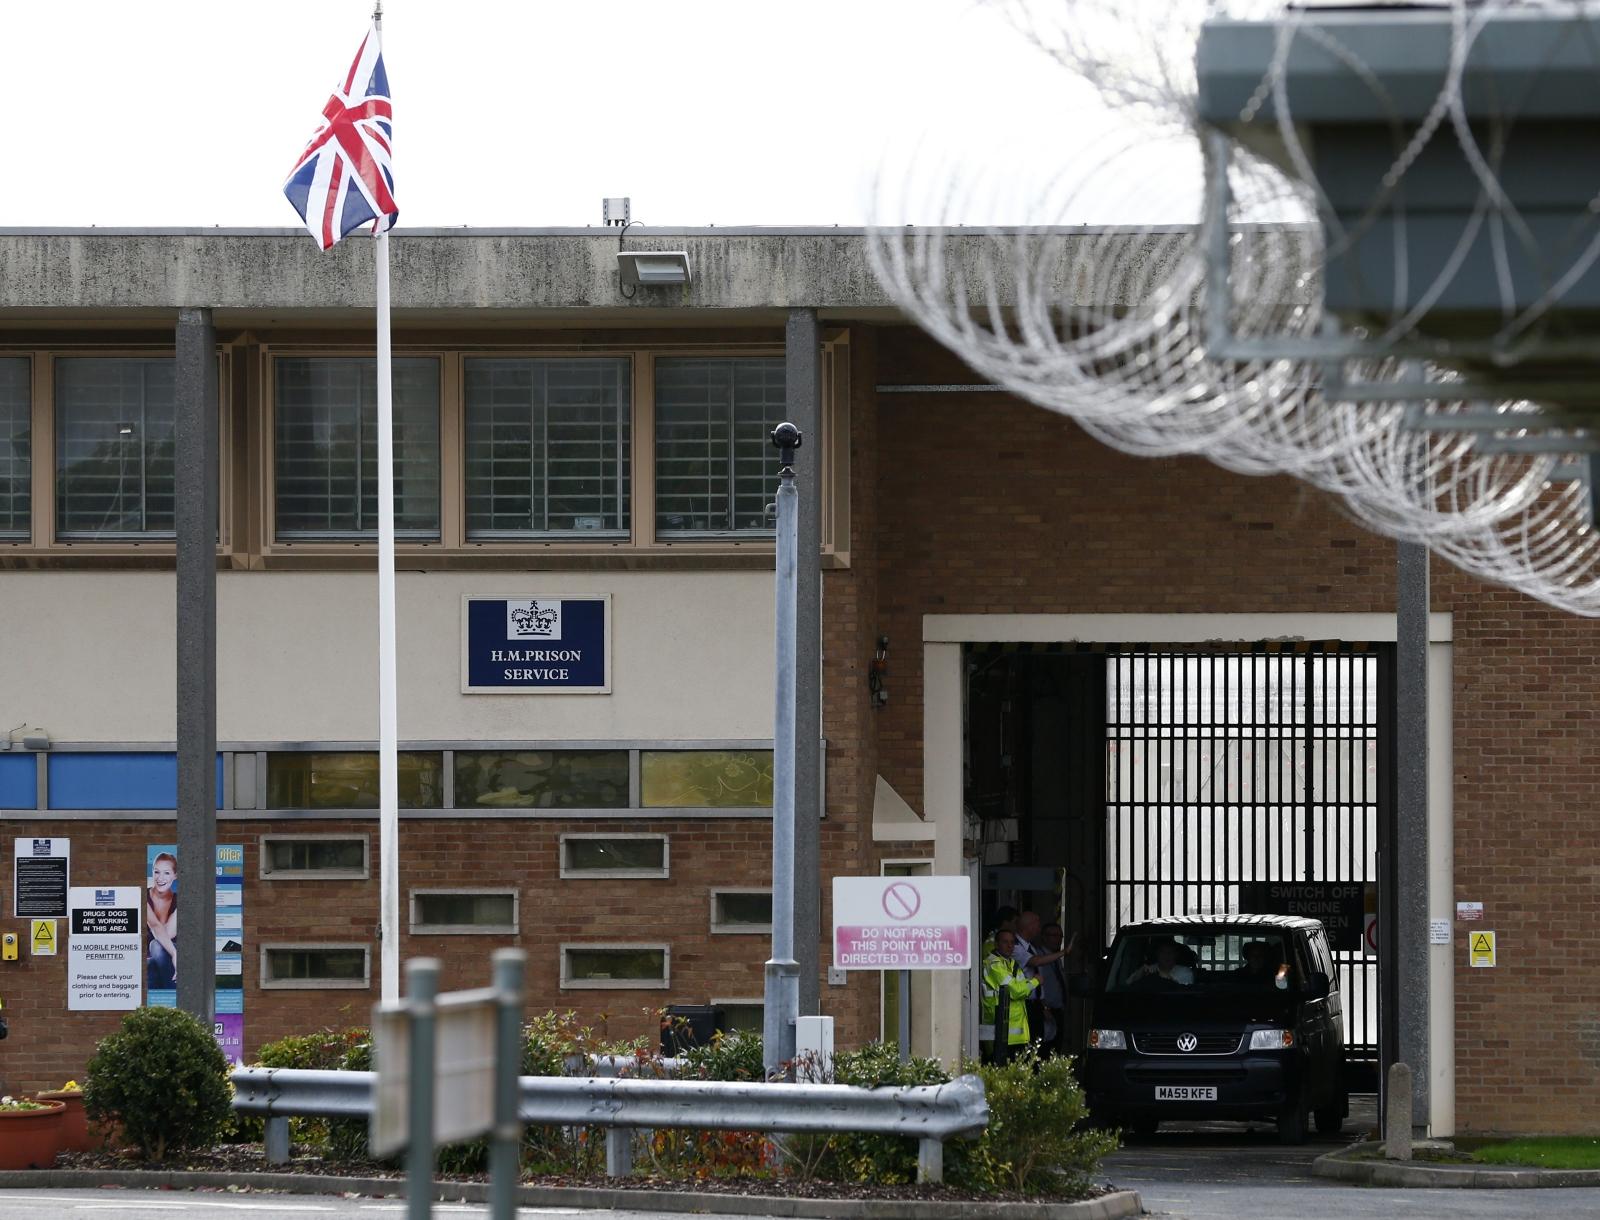 Longmarsh prison